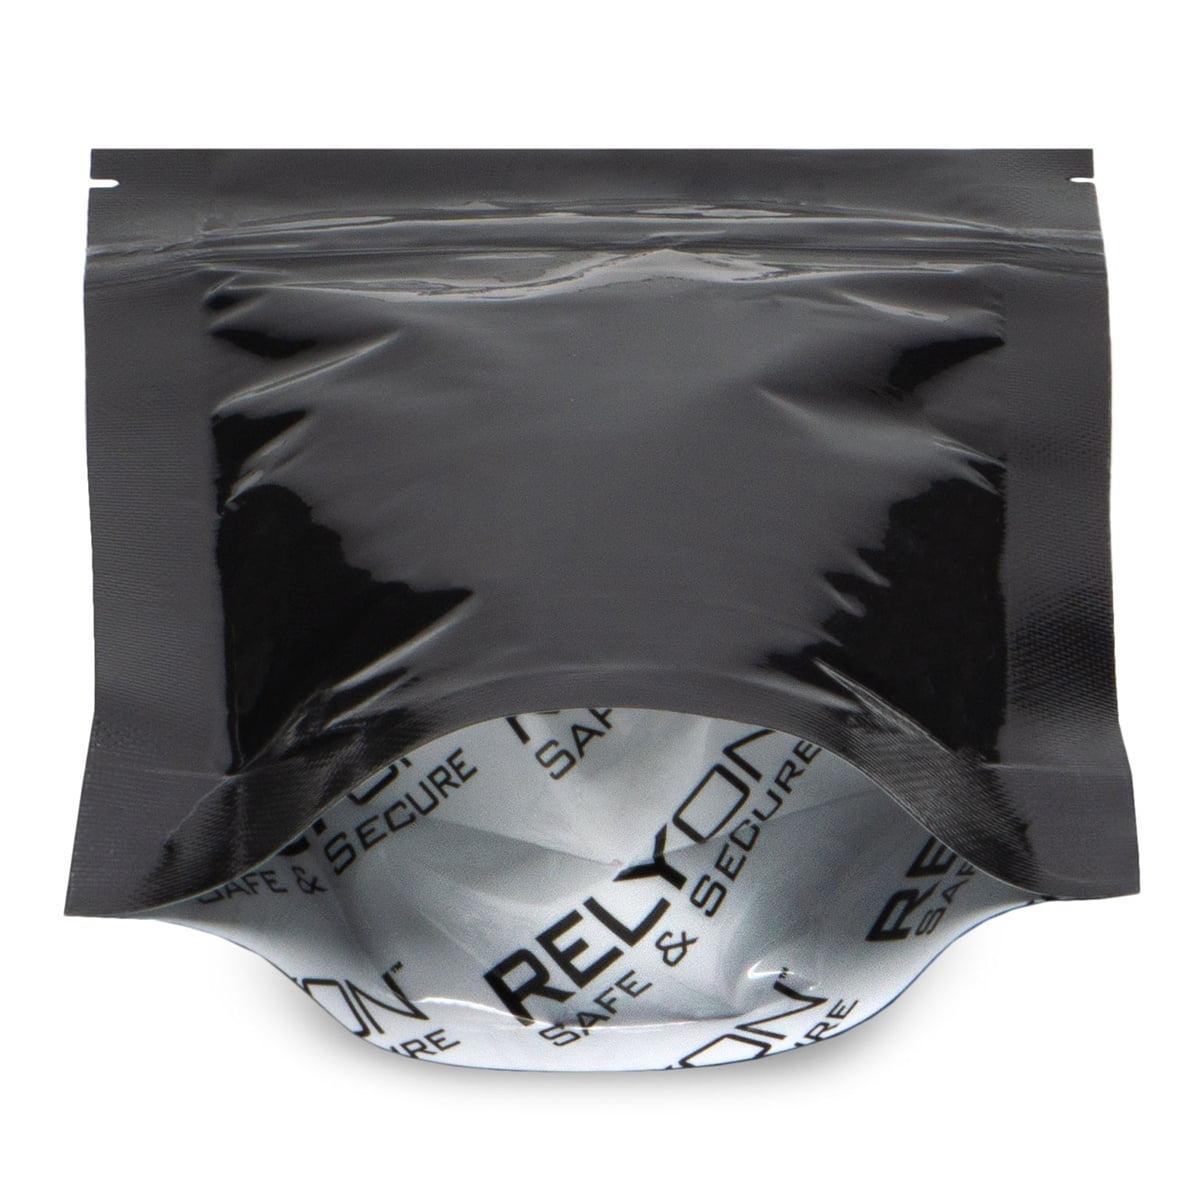 2178 Black Child Resistant 3.75×6×2 (1/8 oz) – 100 Pack